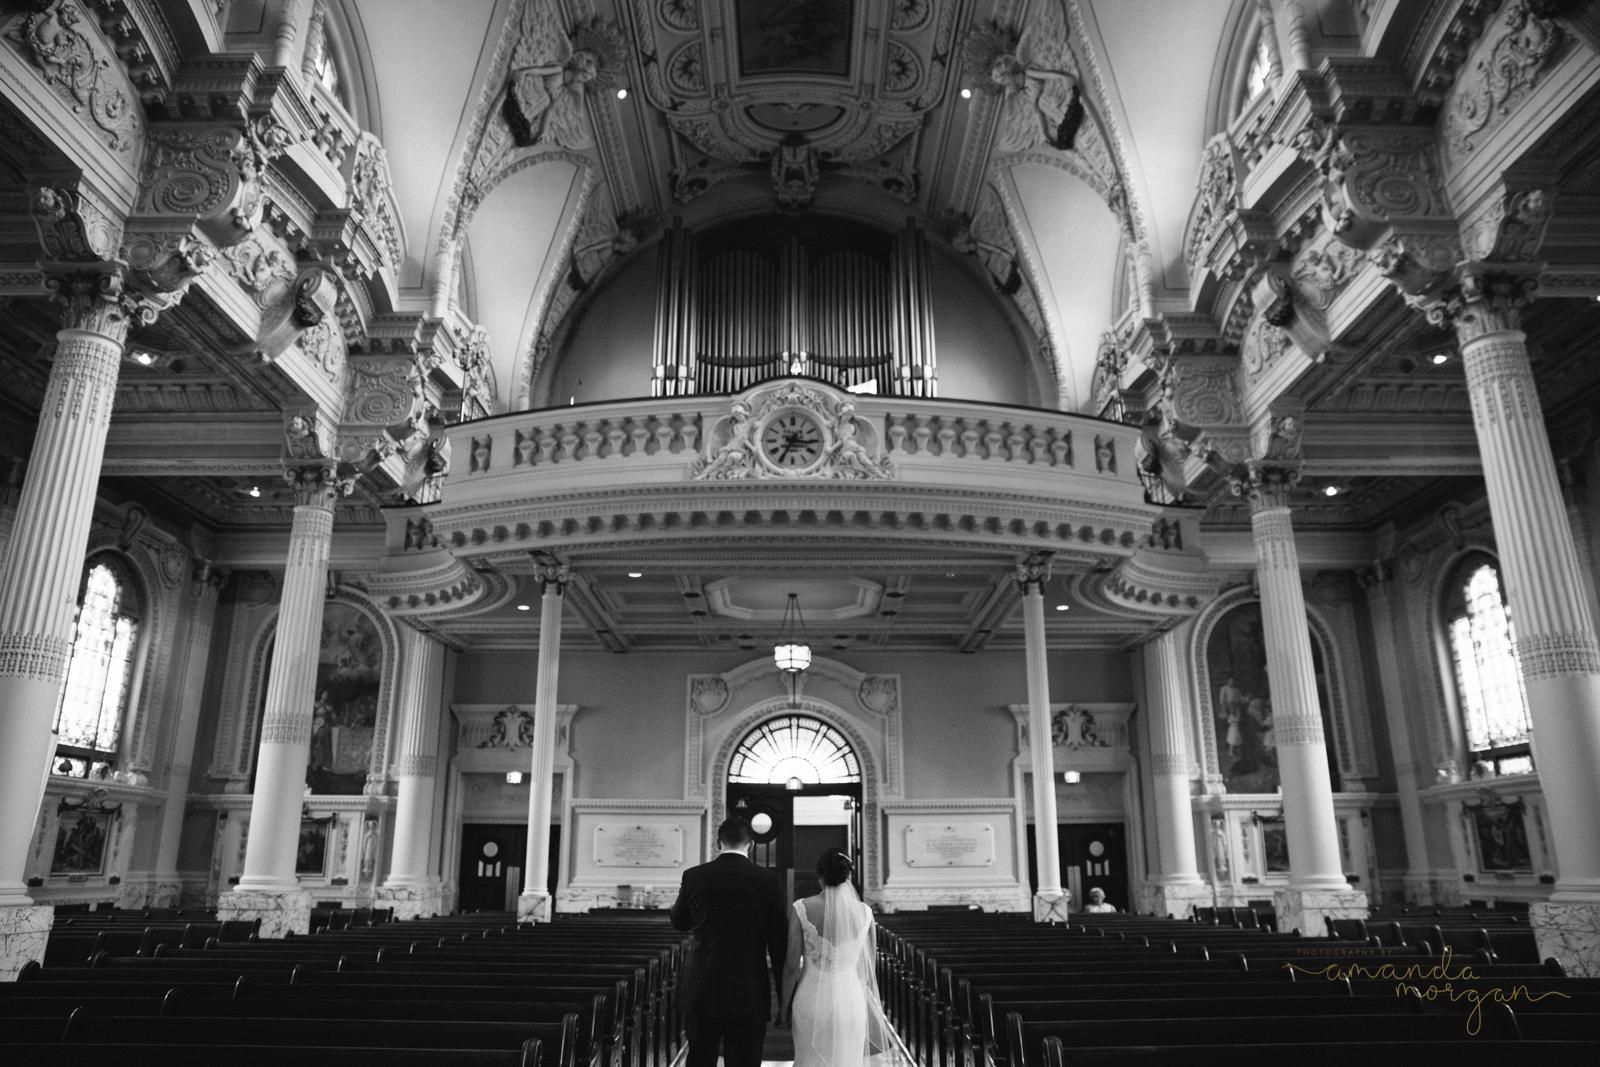 Notre-Dame-Catholic-Church-Wedding-Amanda-Morgan-16.jpg